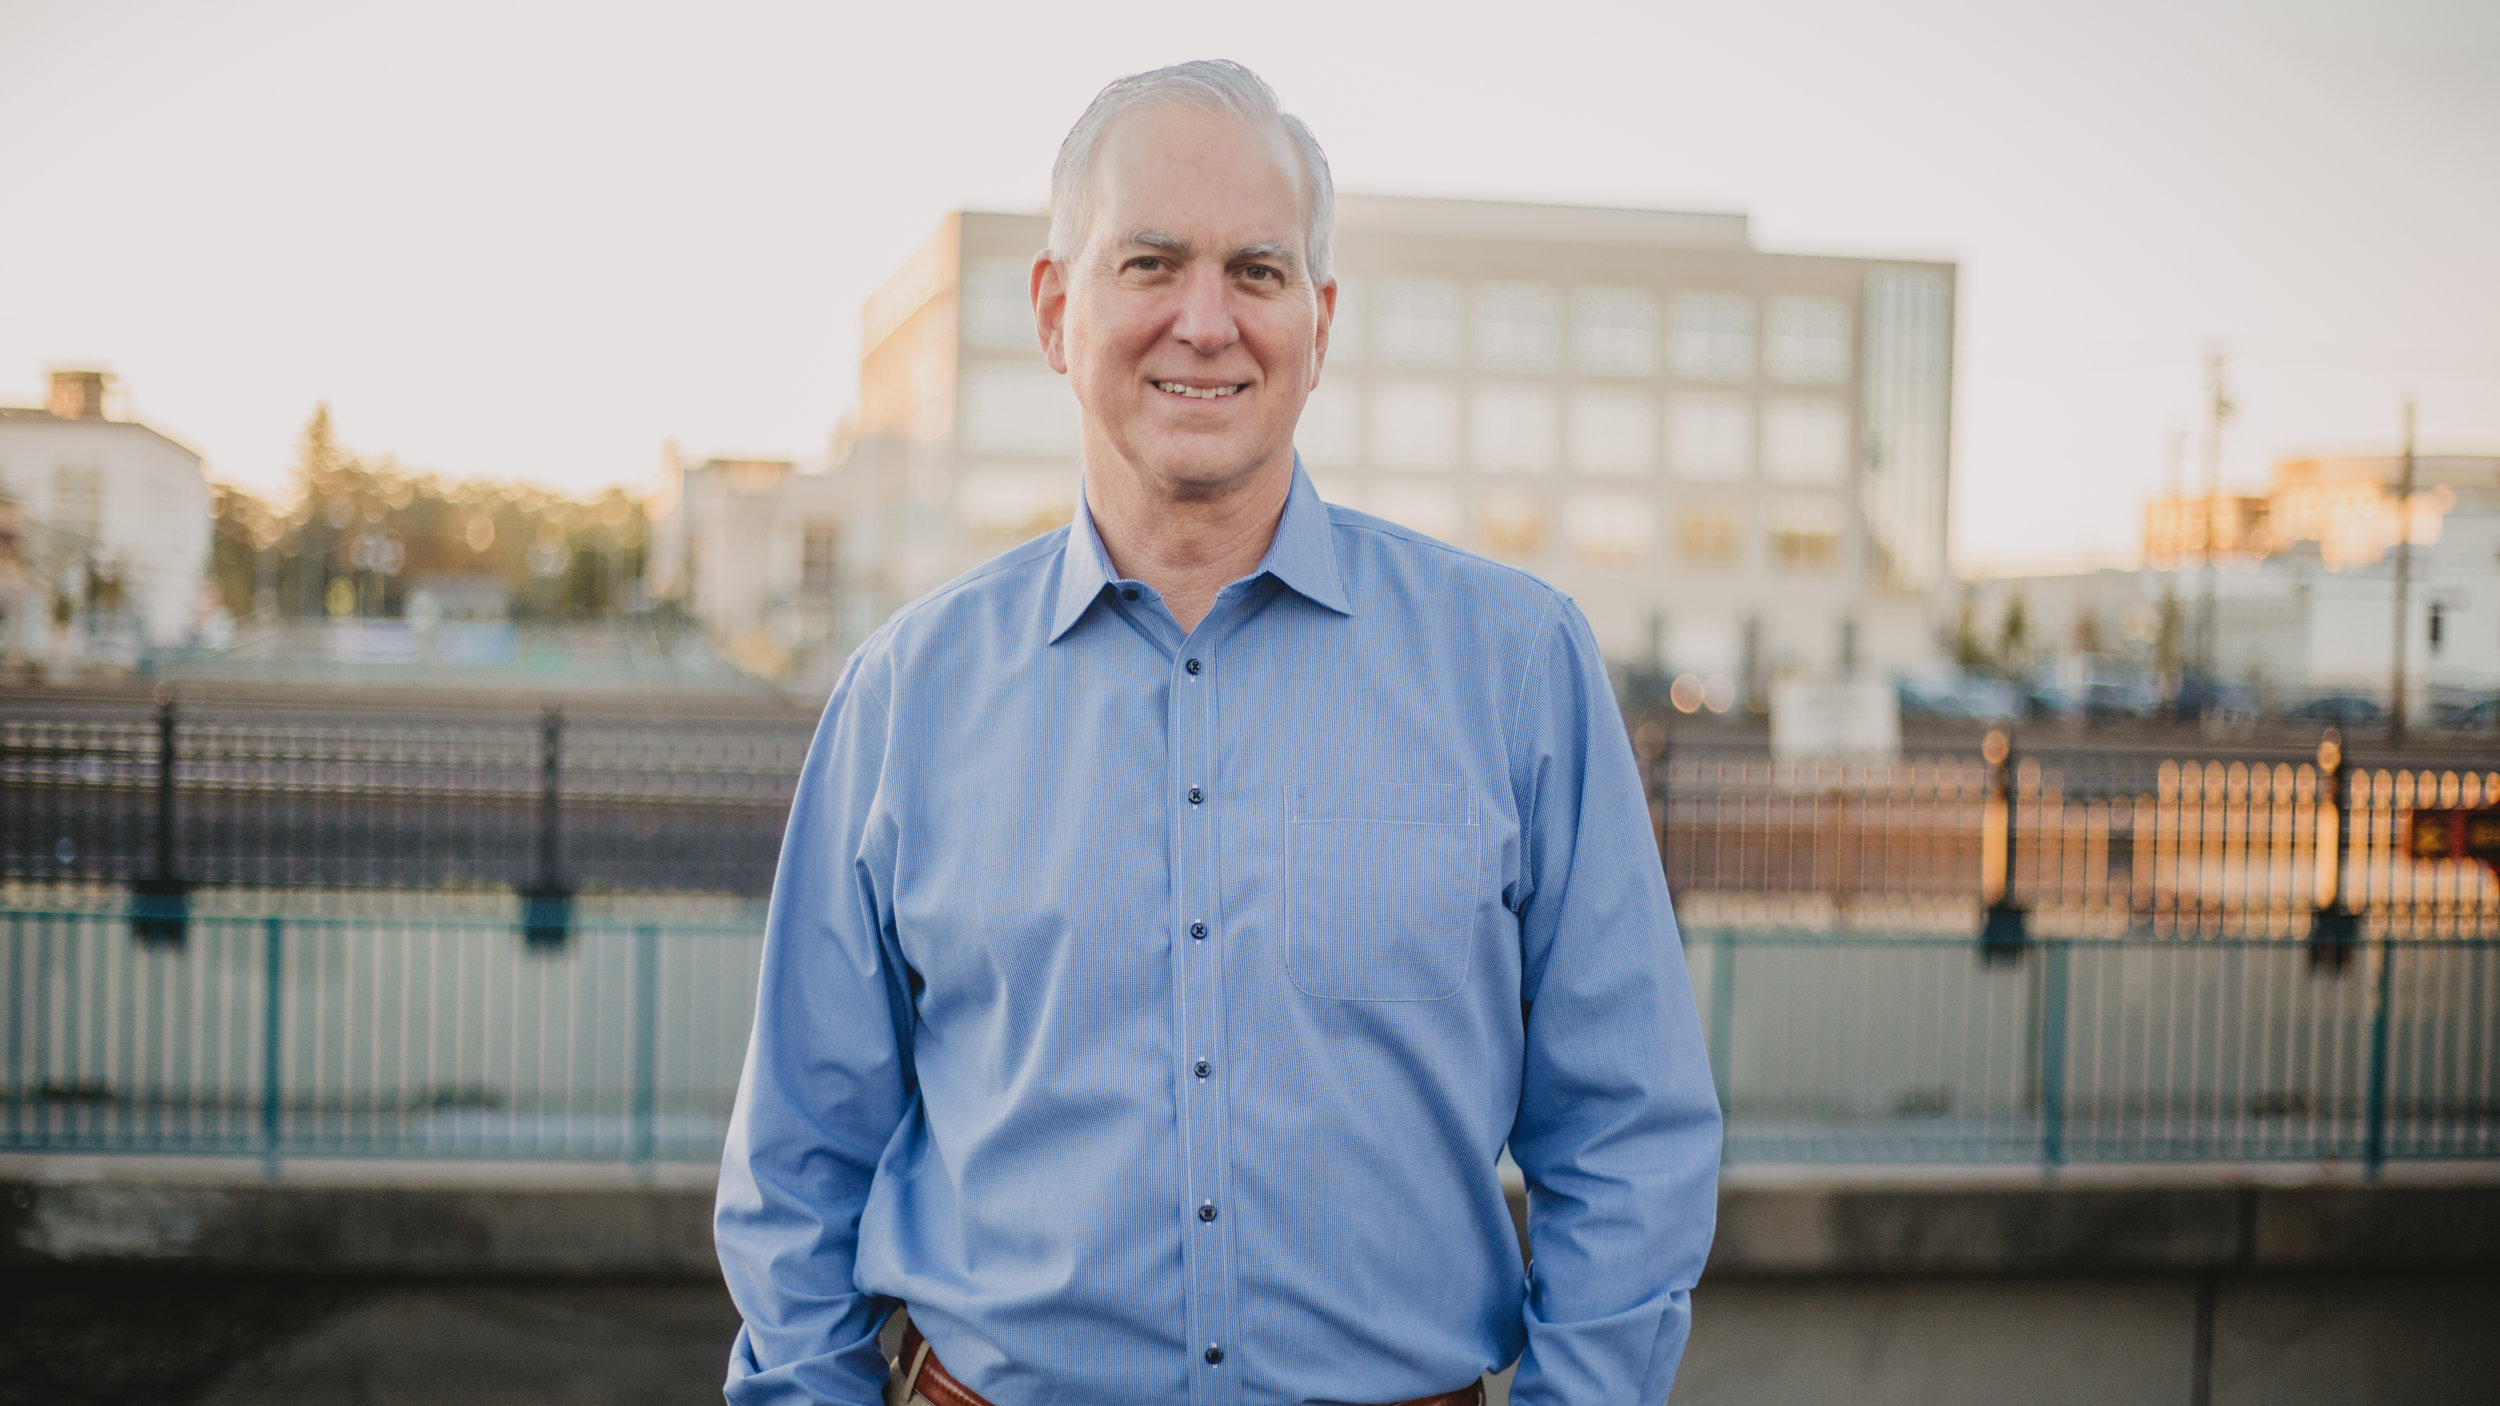 Kent J. MacDiarmid - Owner & President